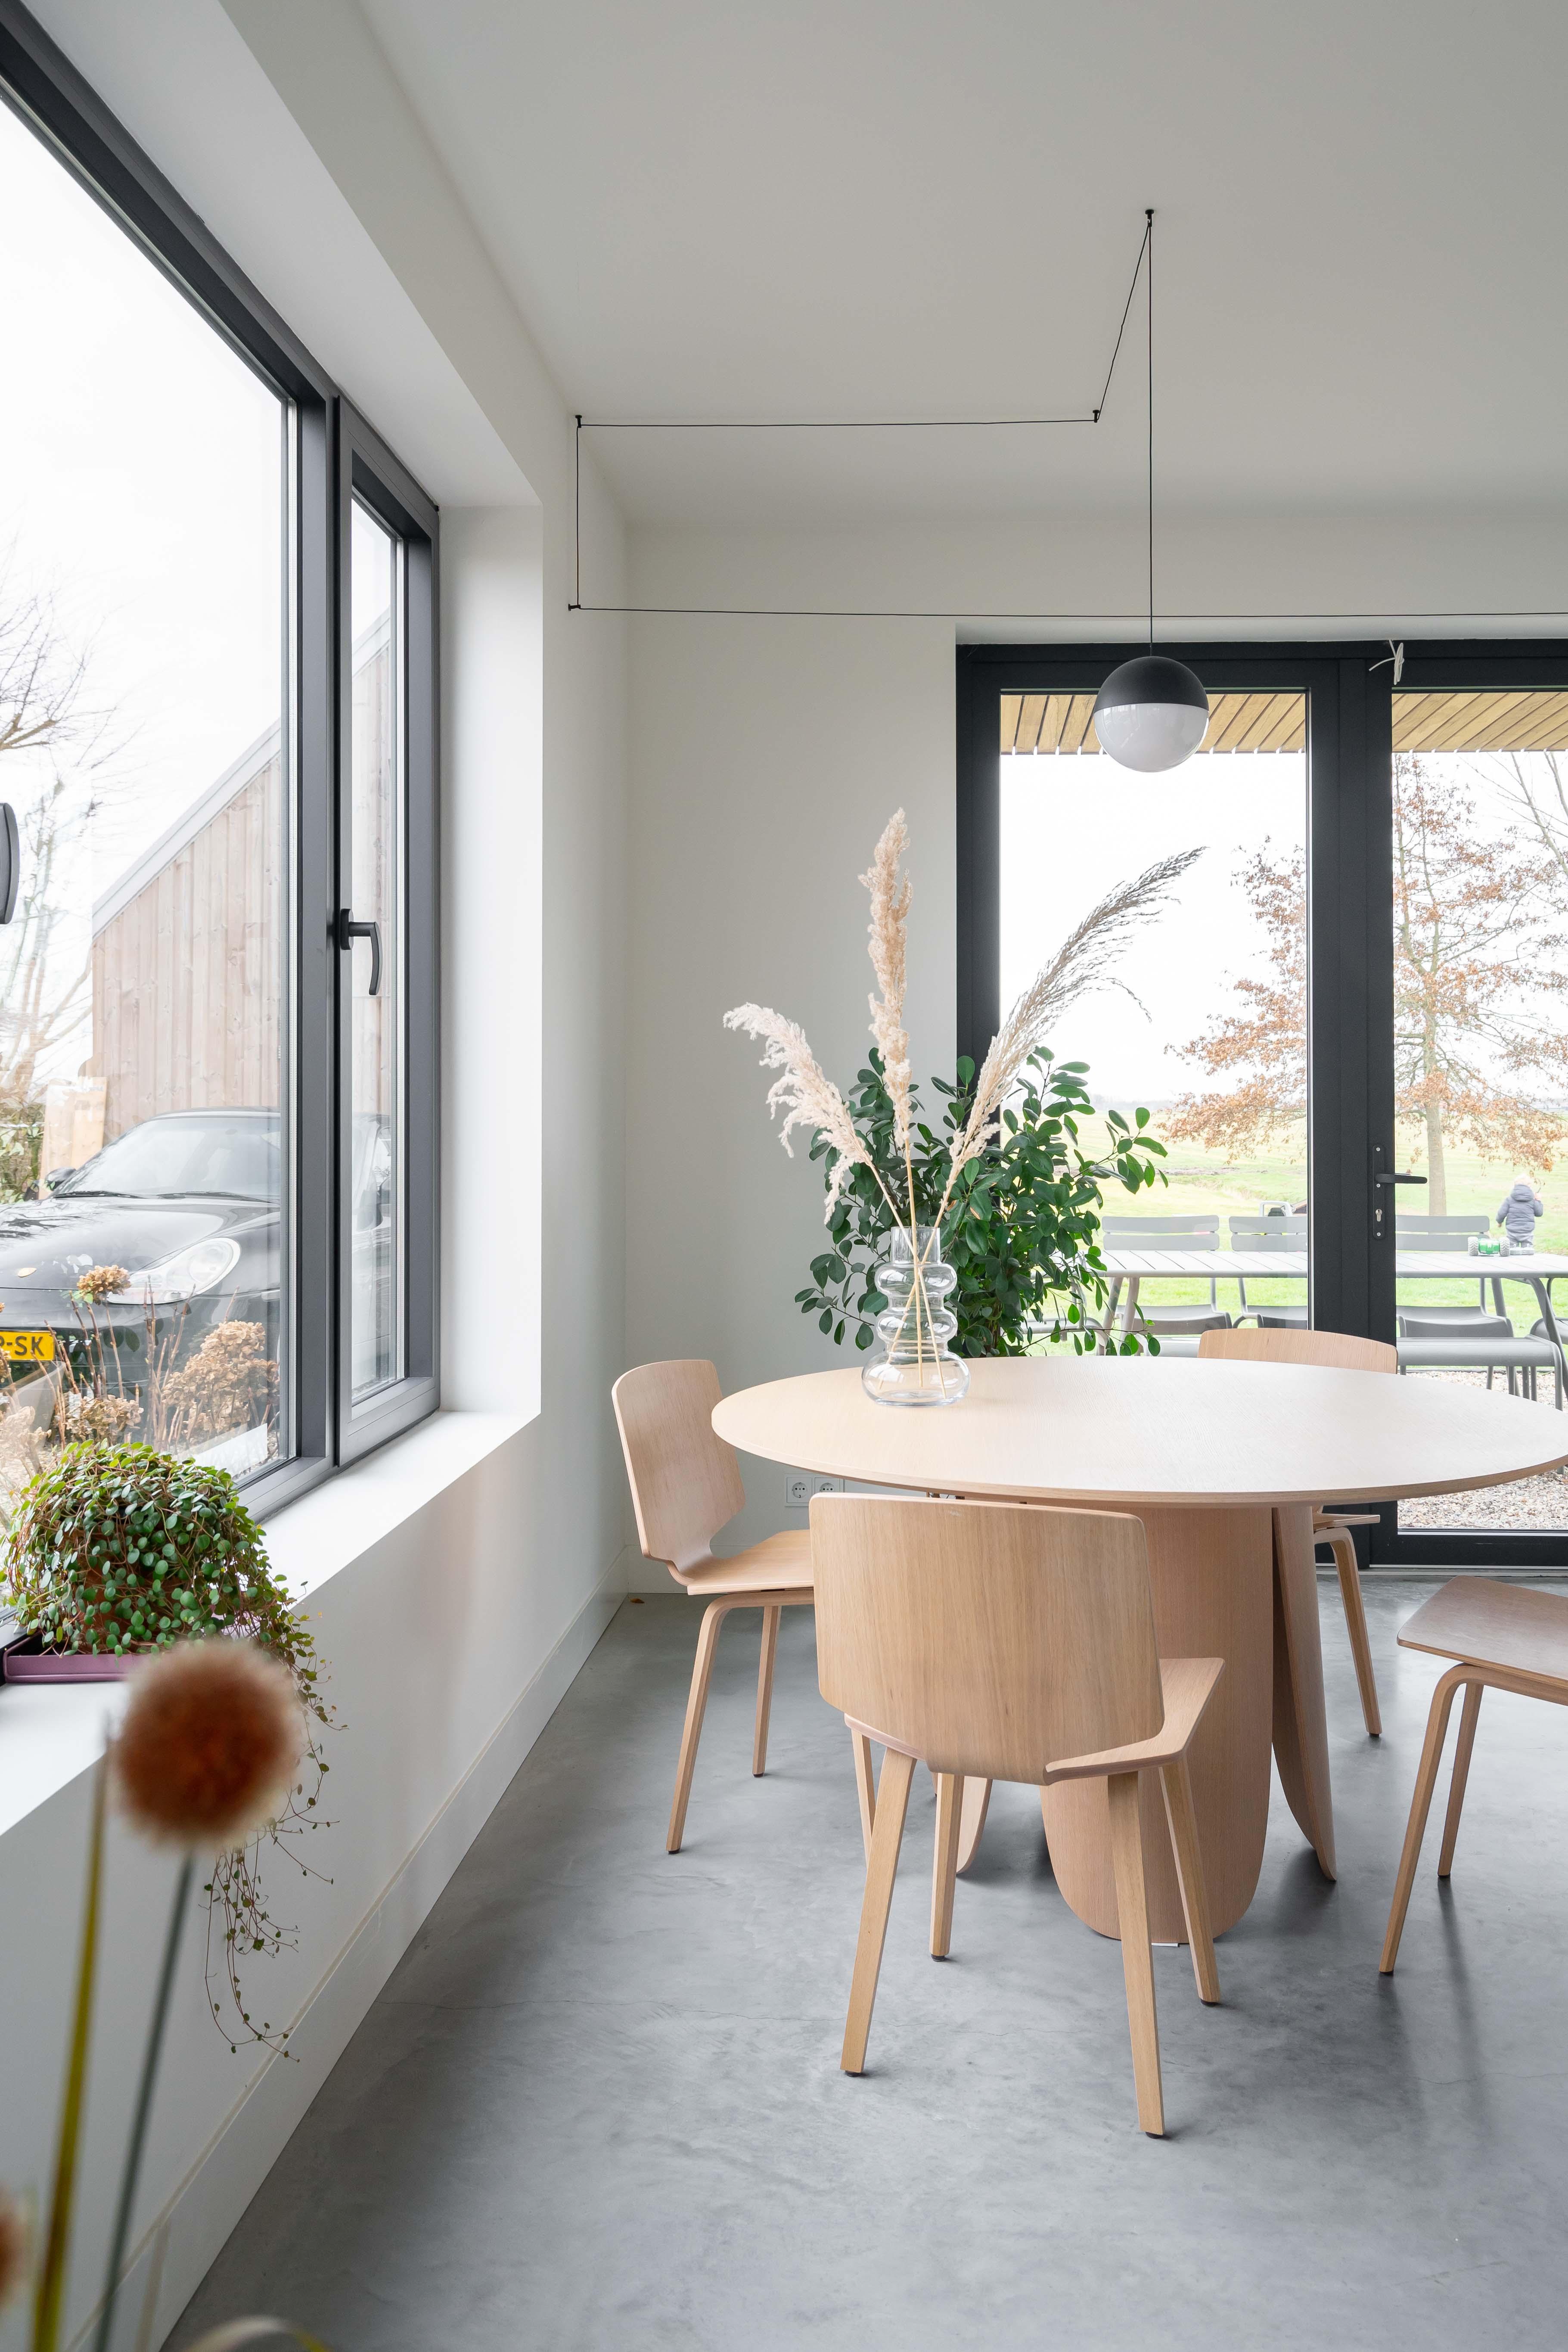 Binnenkijken   Charlotte Kap Fotografie   Interieurfotografie   Interieurontwerpster Mies Interieur